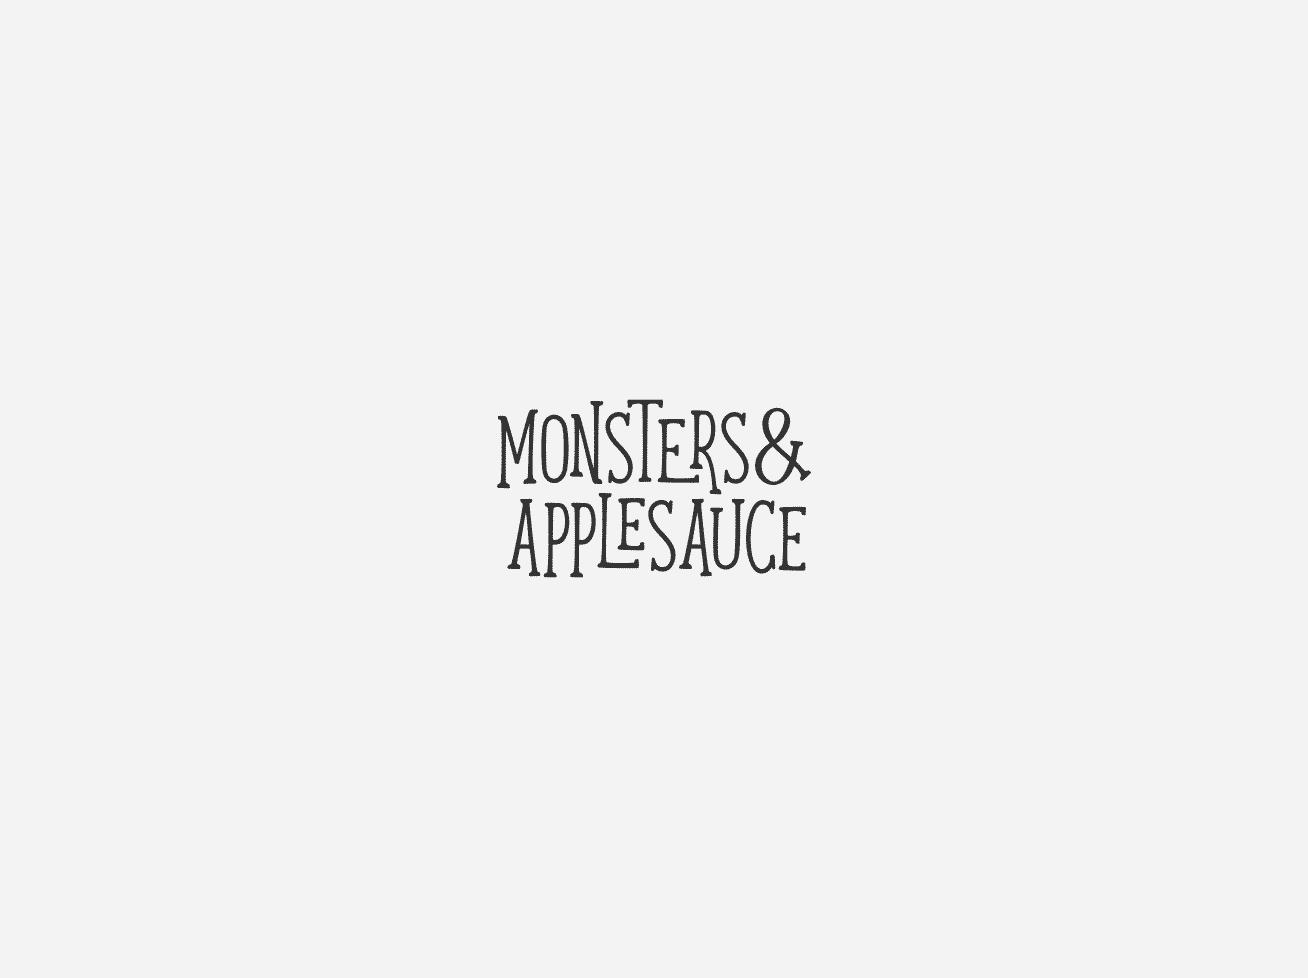 monstersandapplesauce